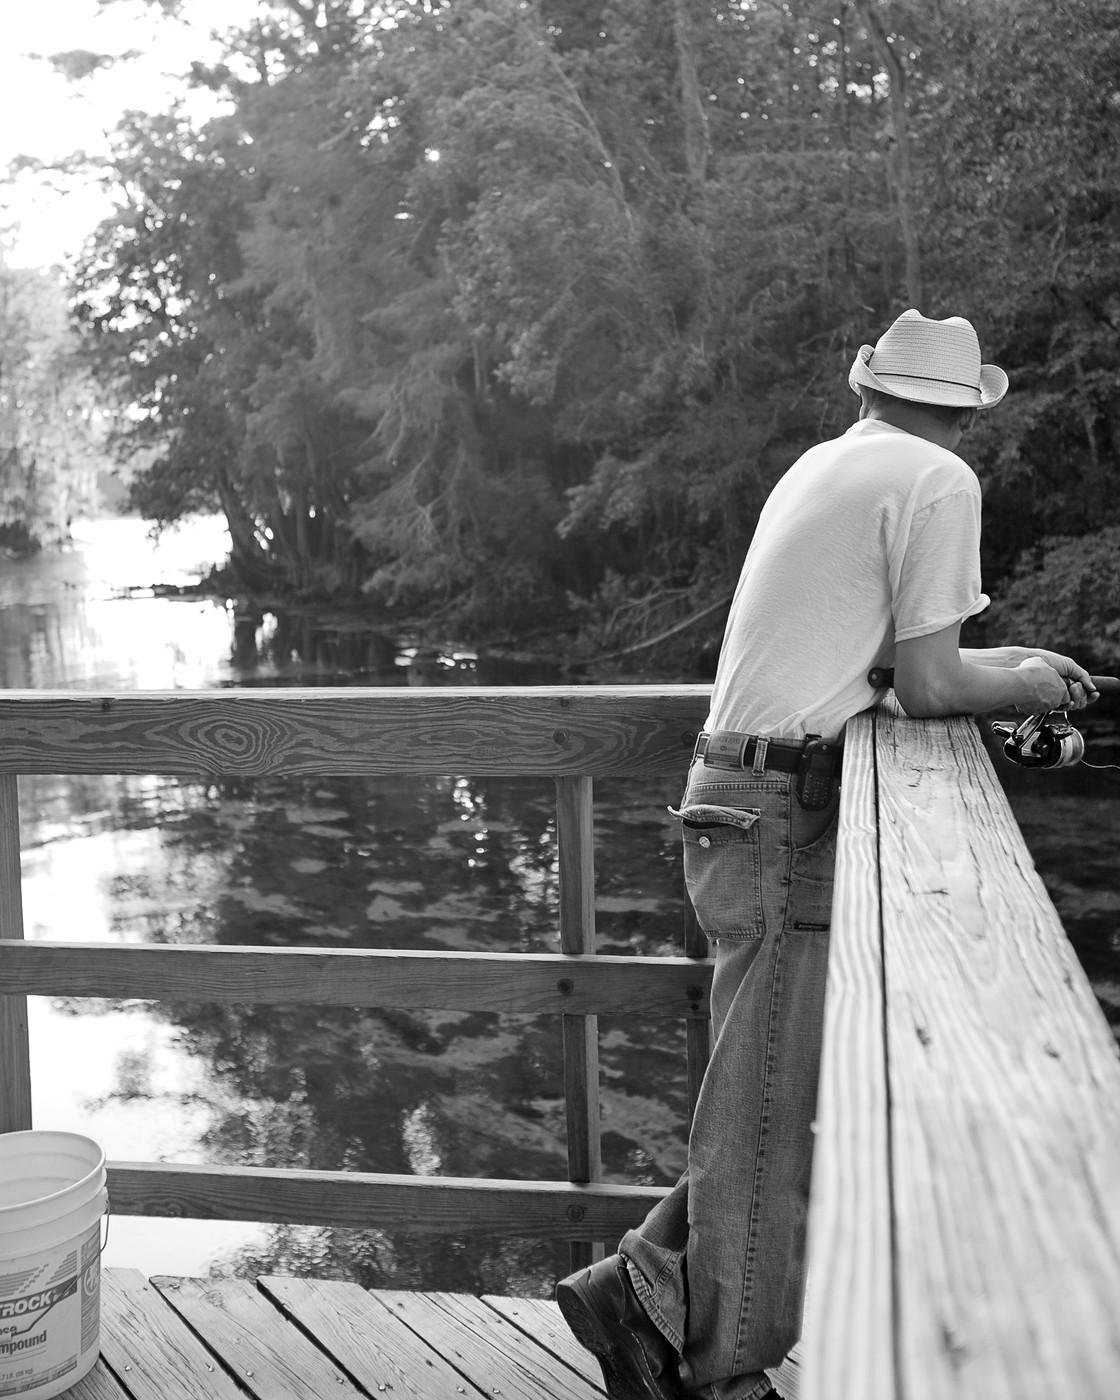 Fisherman on the Suwannee